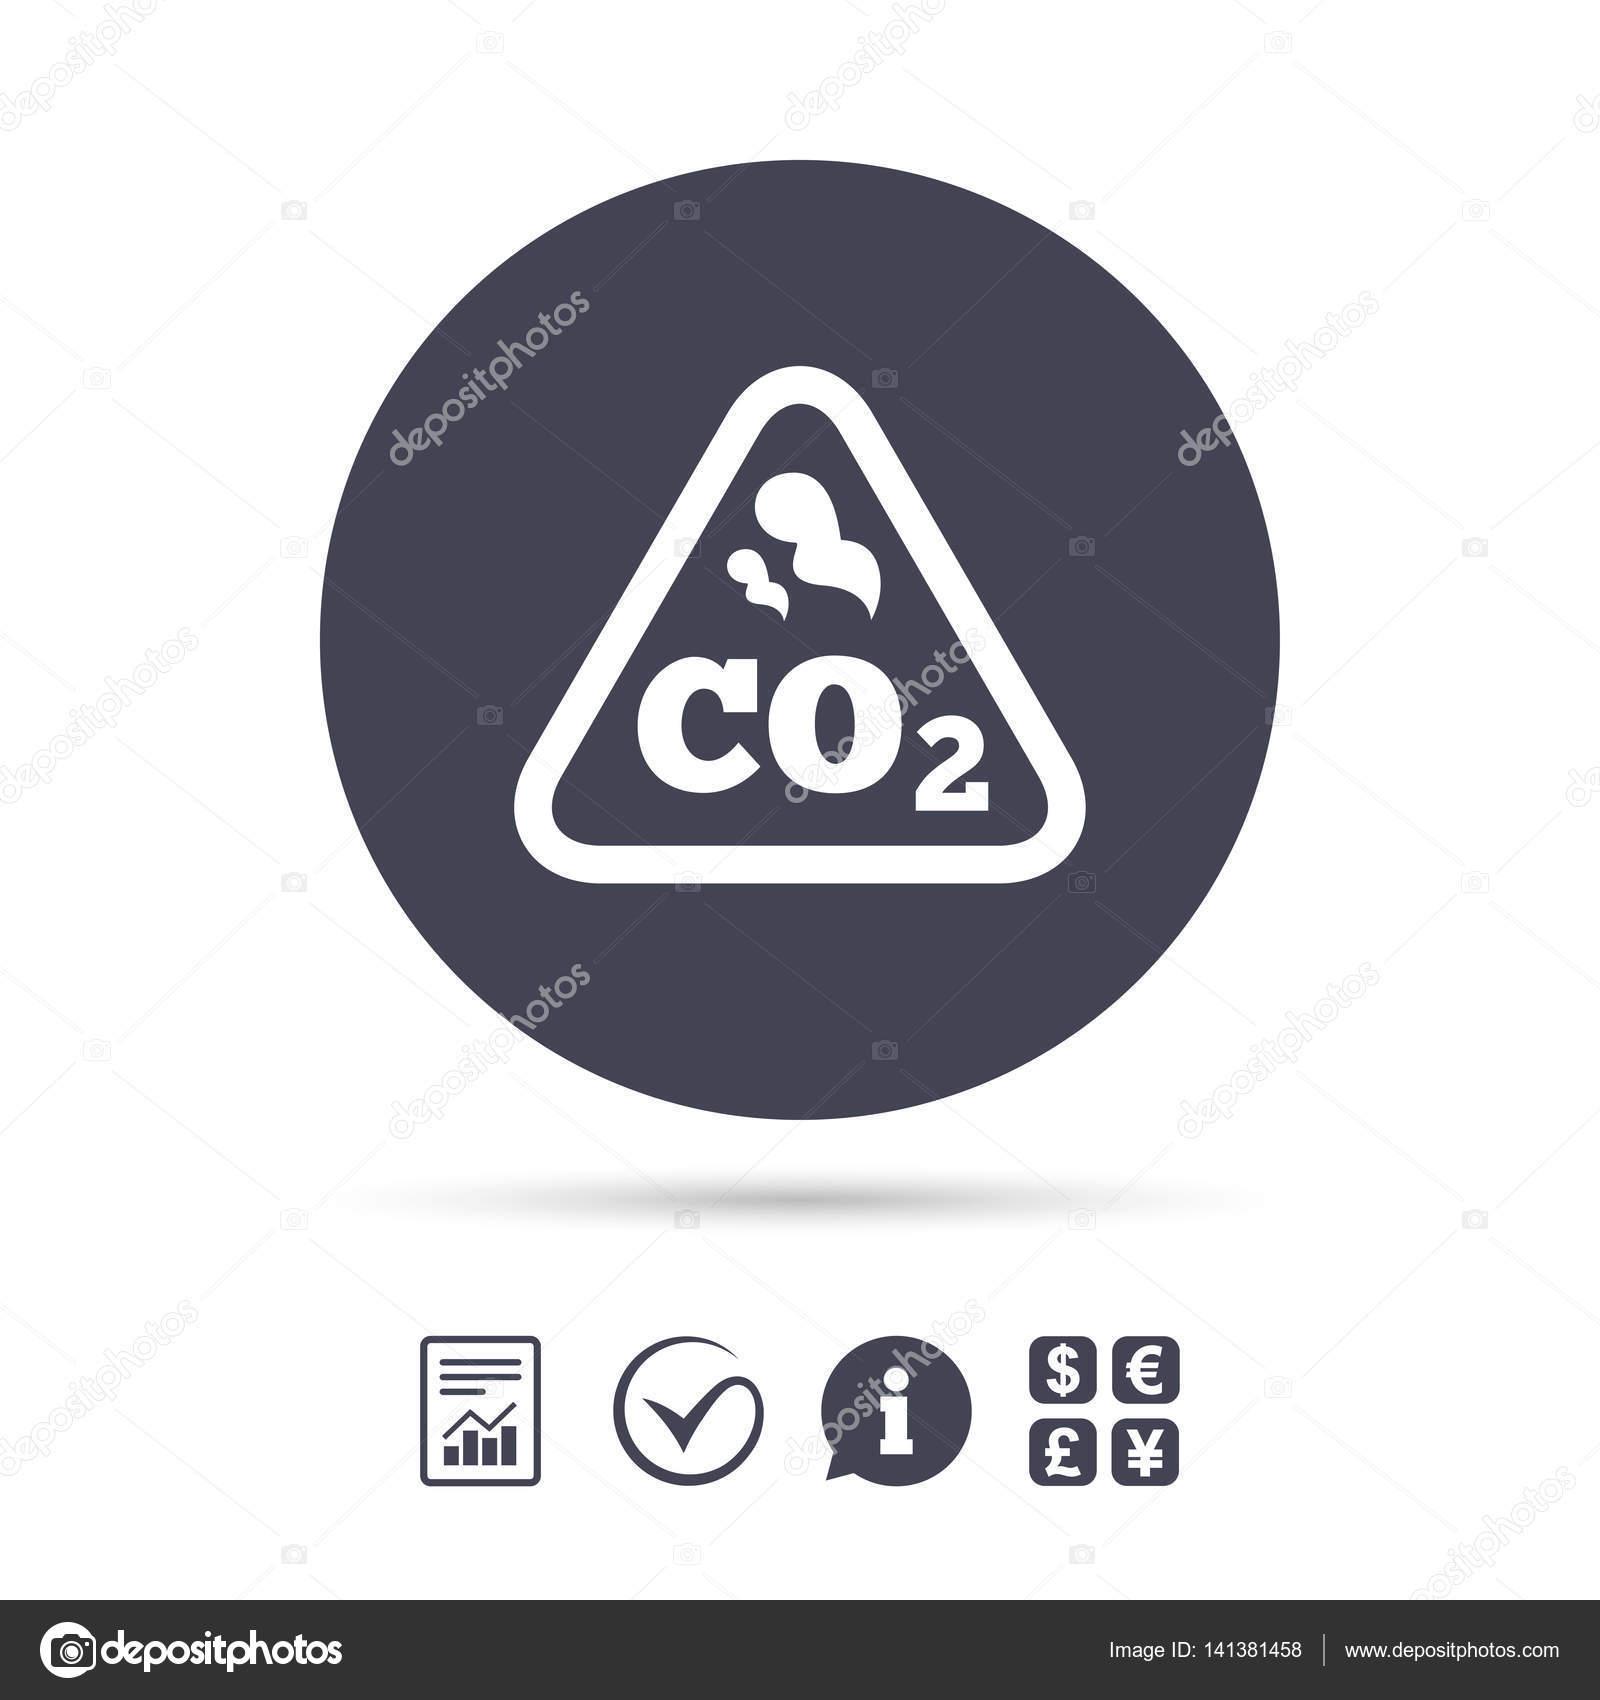 Co2 carbon dioxide formula icon stock vector blankstock 141381458 co2 carbon dioxide formula sign icon chemistry symbol vector vector by blankstock buycottarizona Images